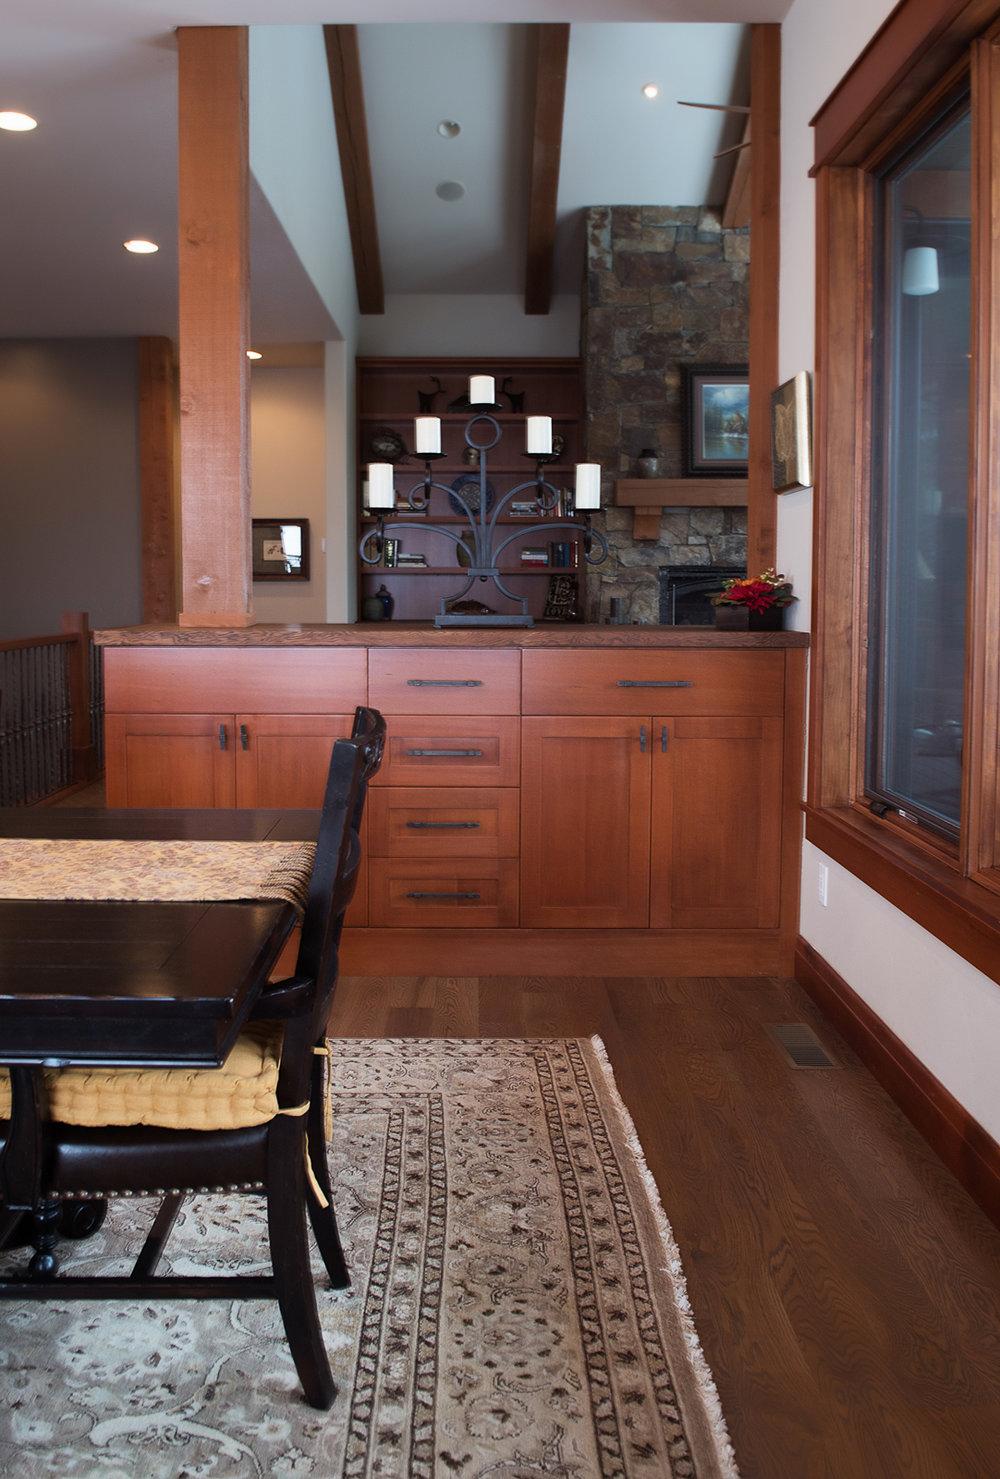 Woodworks-West-Bozeman-Montana-Builder-Cabinetry-Remodel-New-Construction-3519.jpg